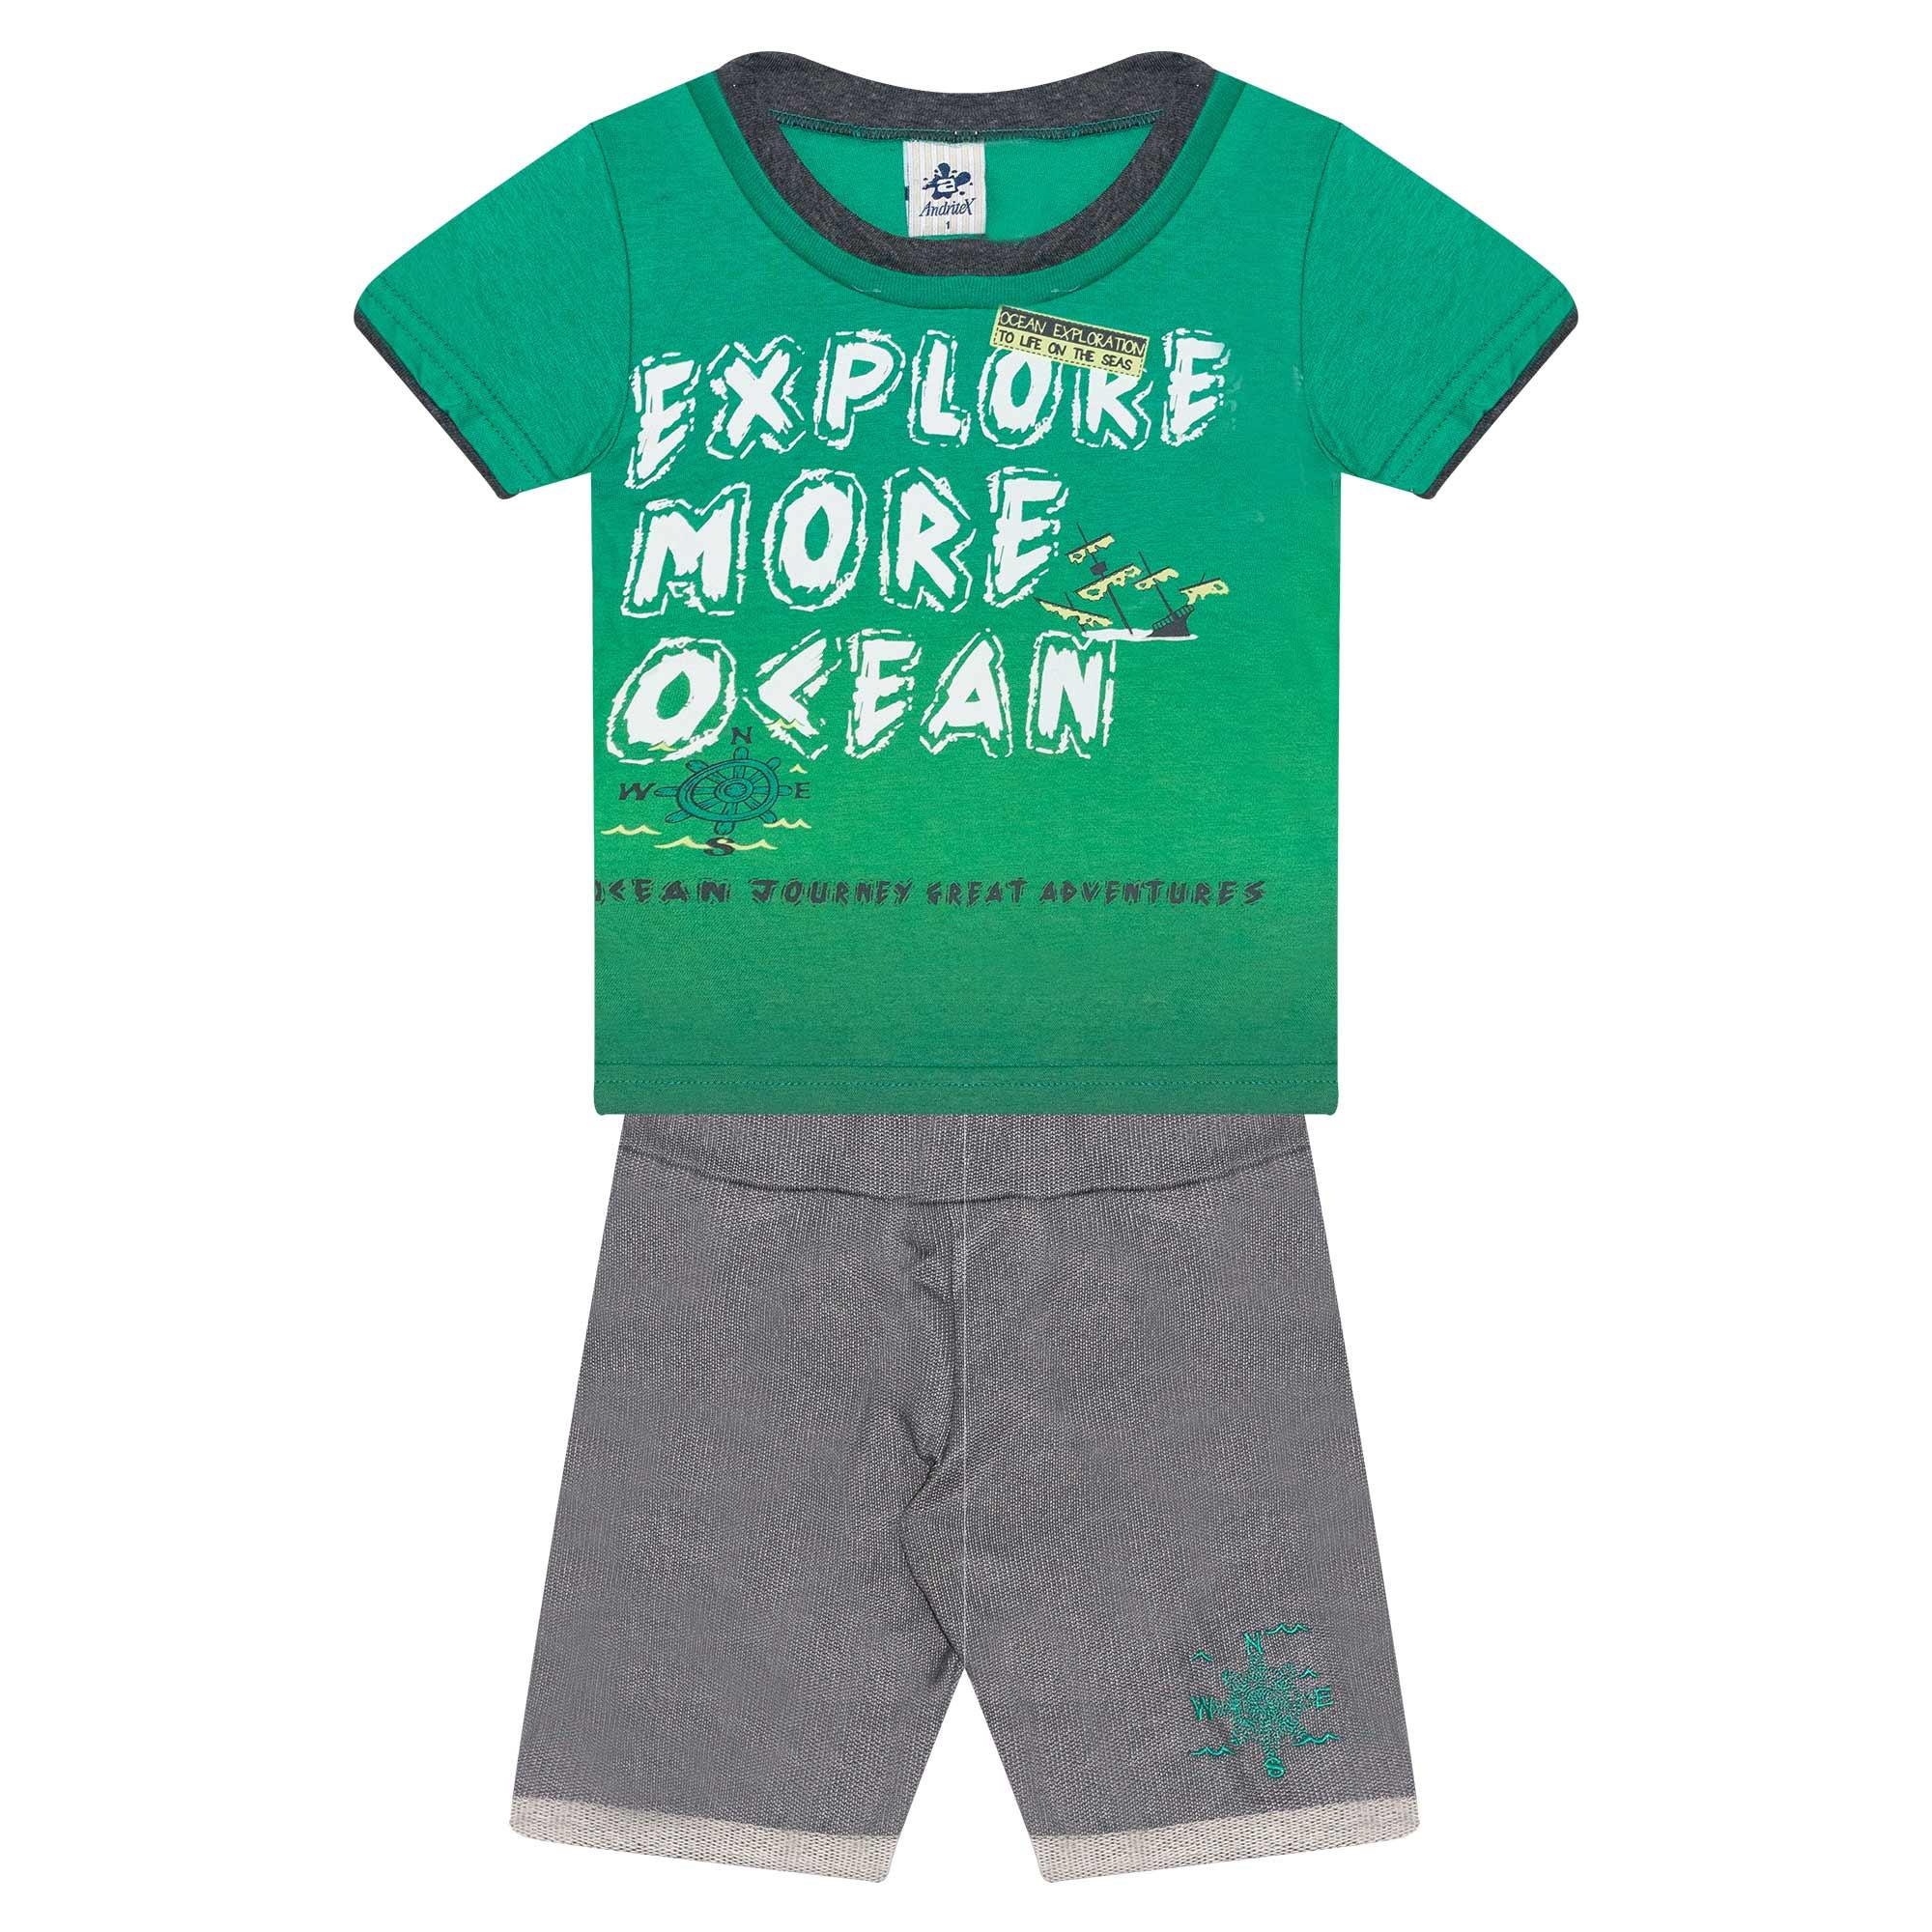 Conjunto Infantil Masculino - Ref 4728  - Verde - Andritex